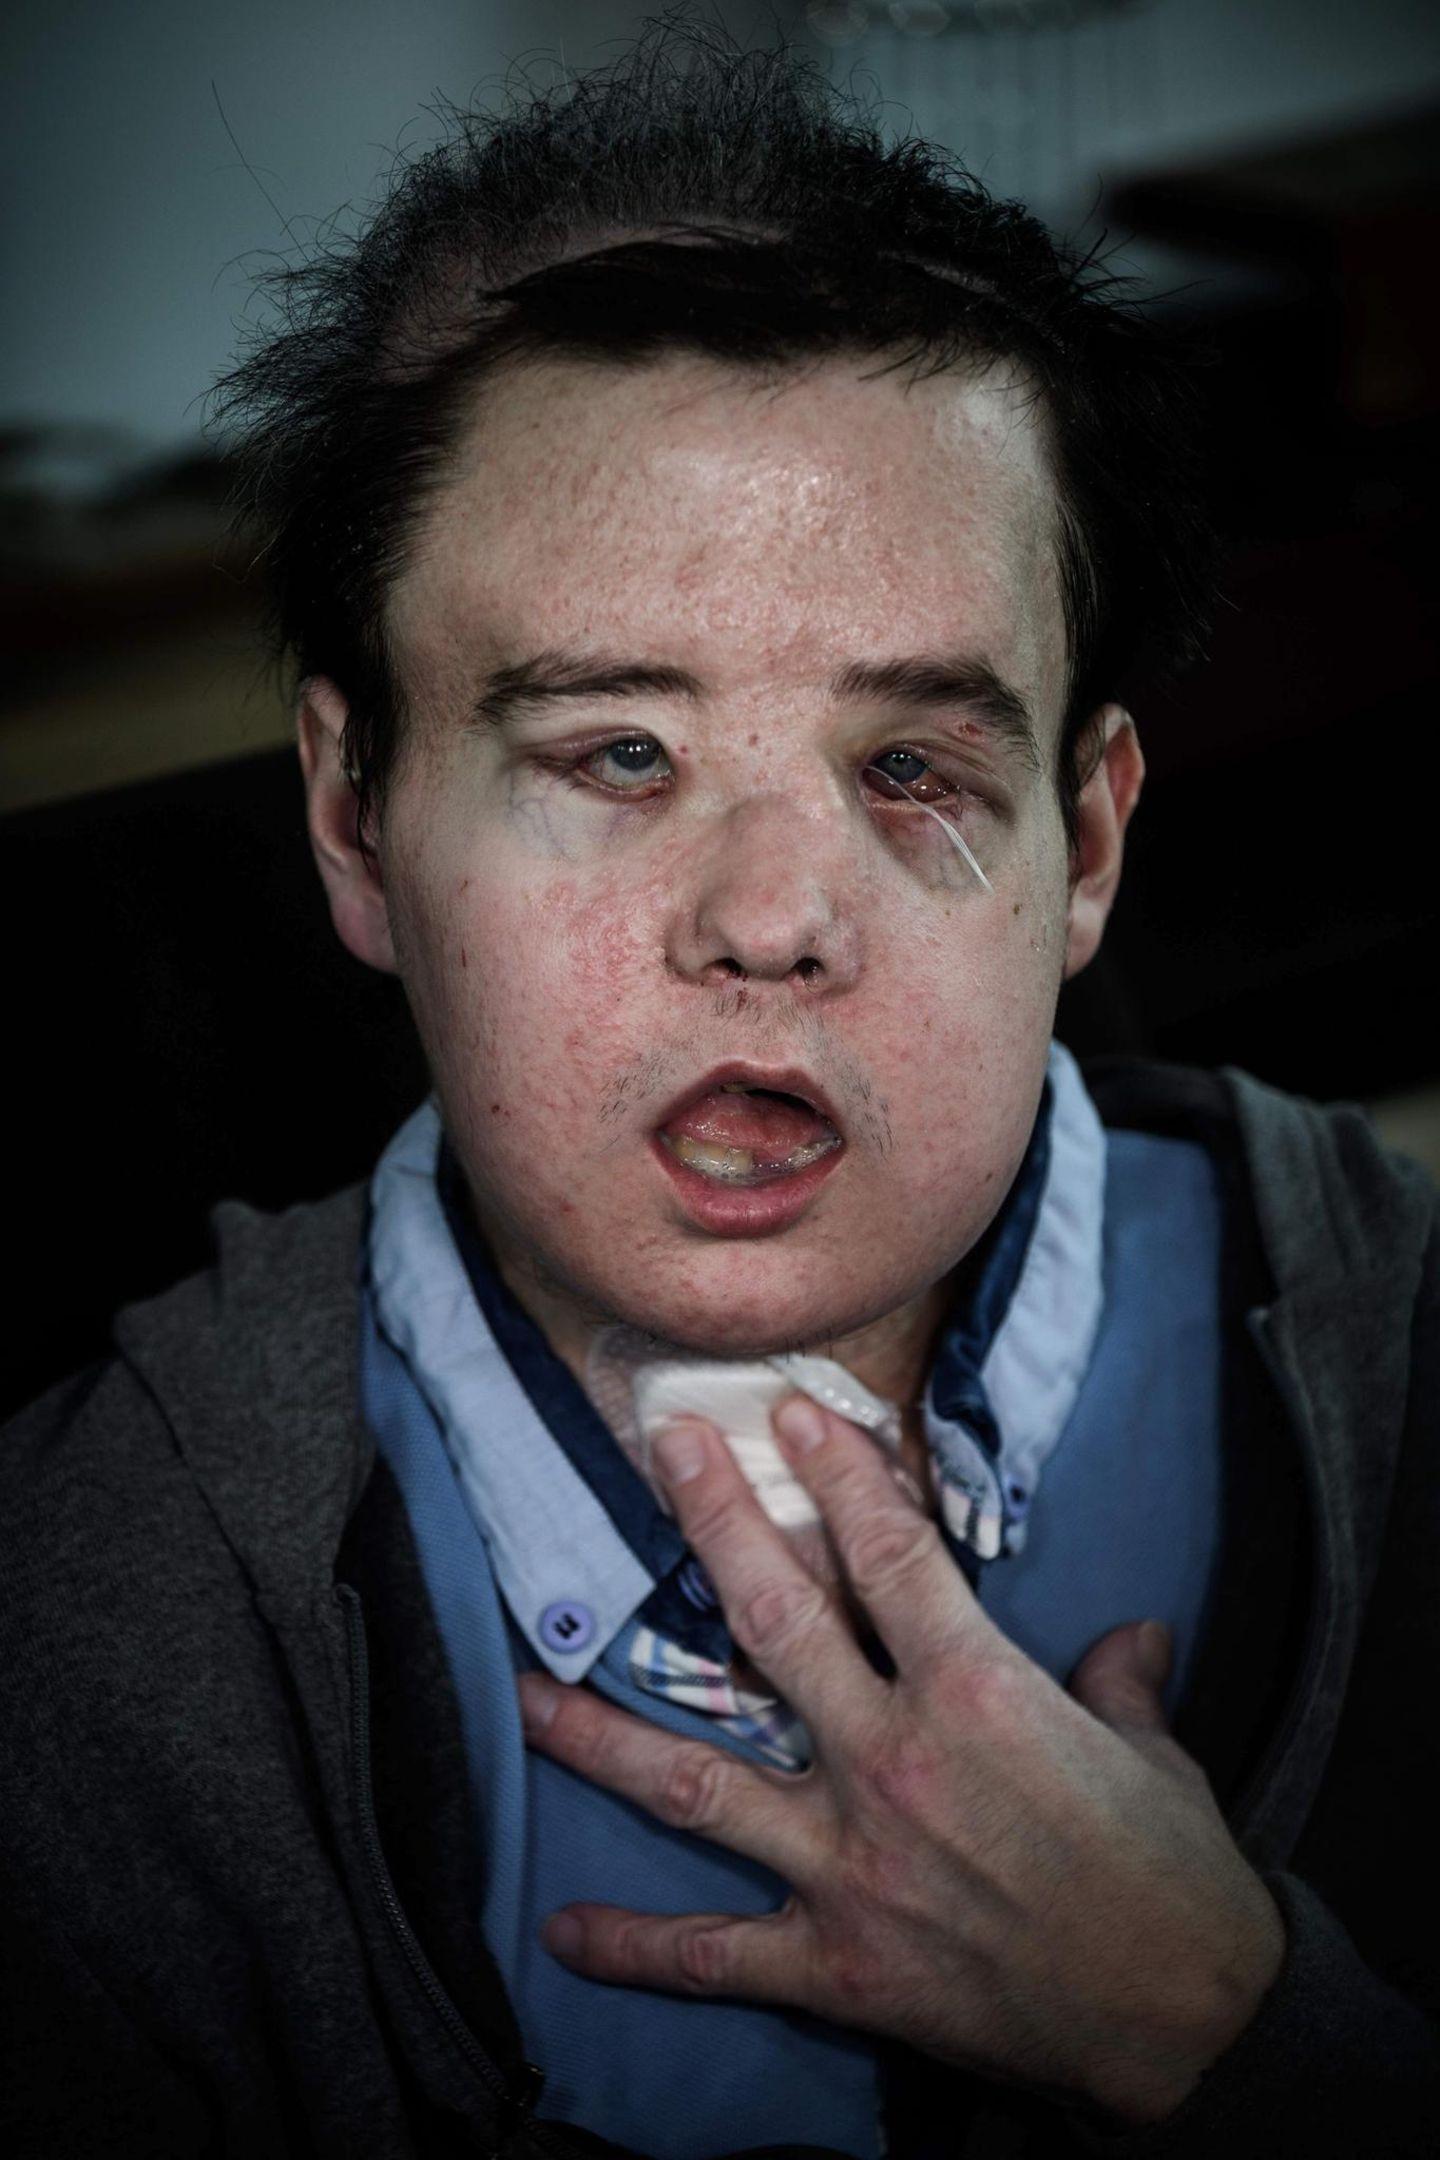 Portrait von Jérôme Hamon nach Operation